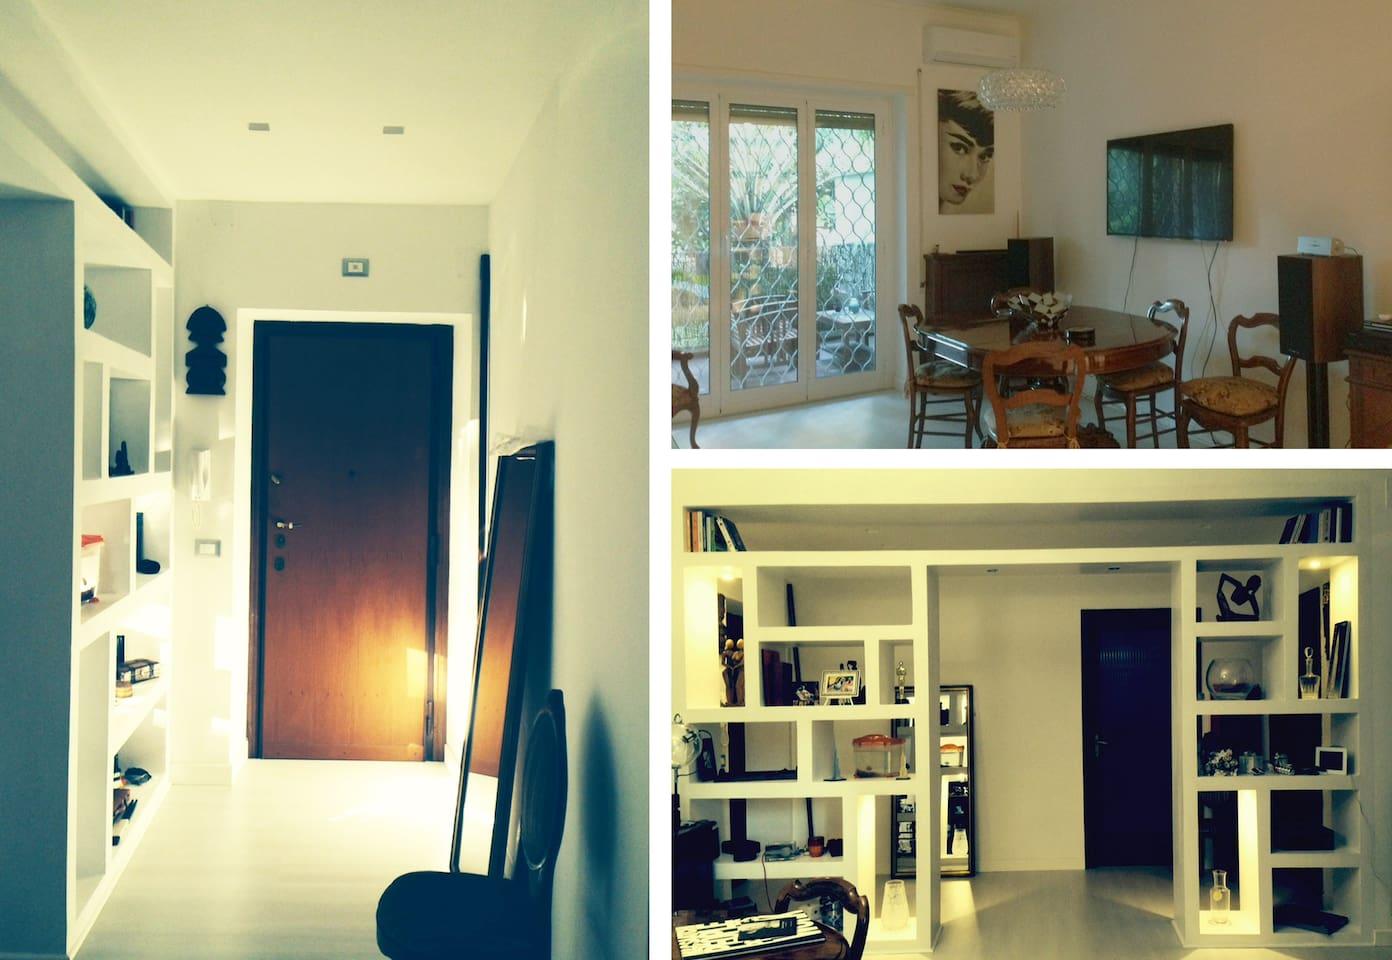 Newly refurbished apartment